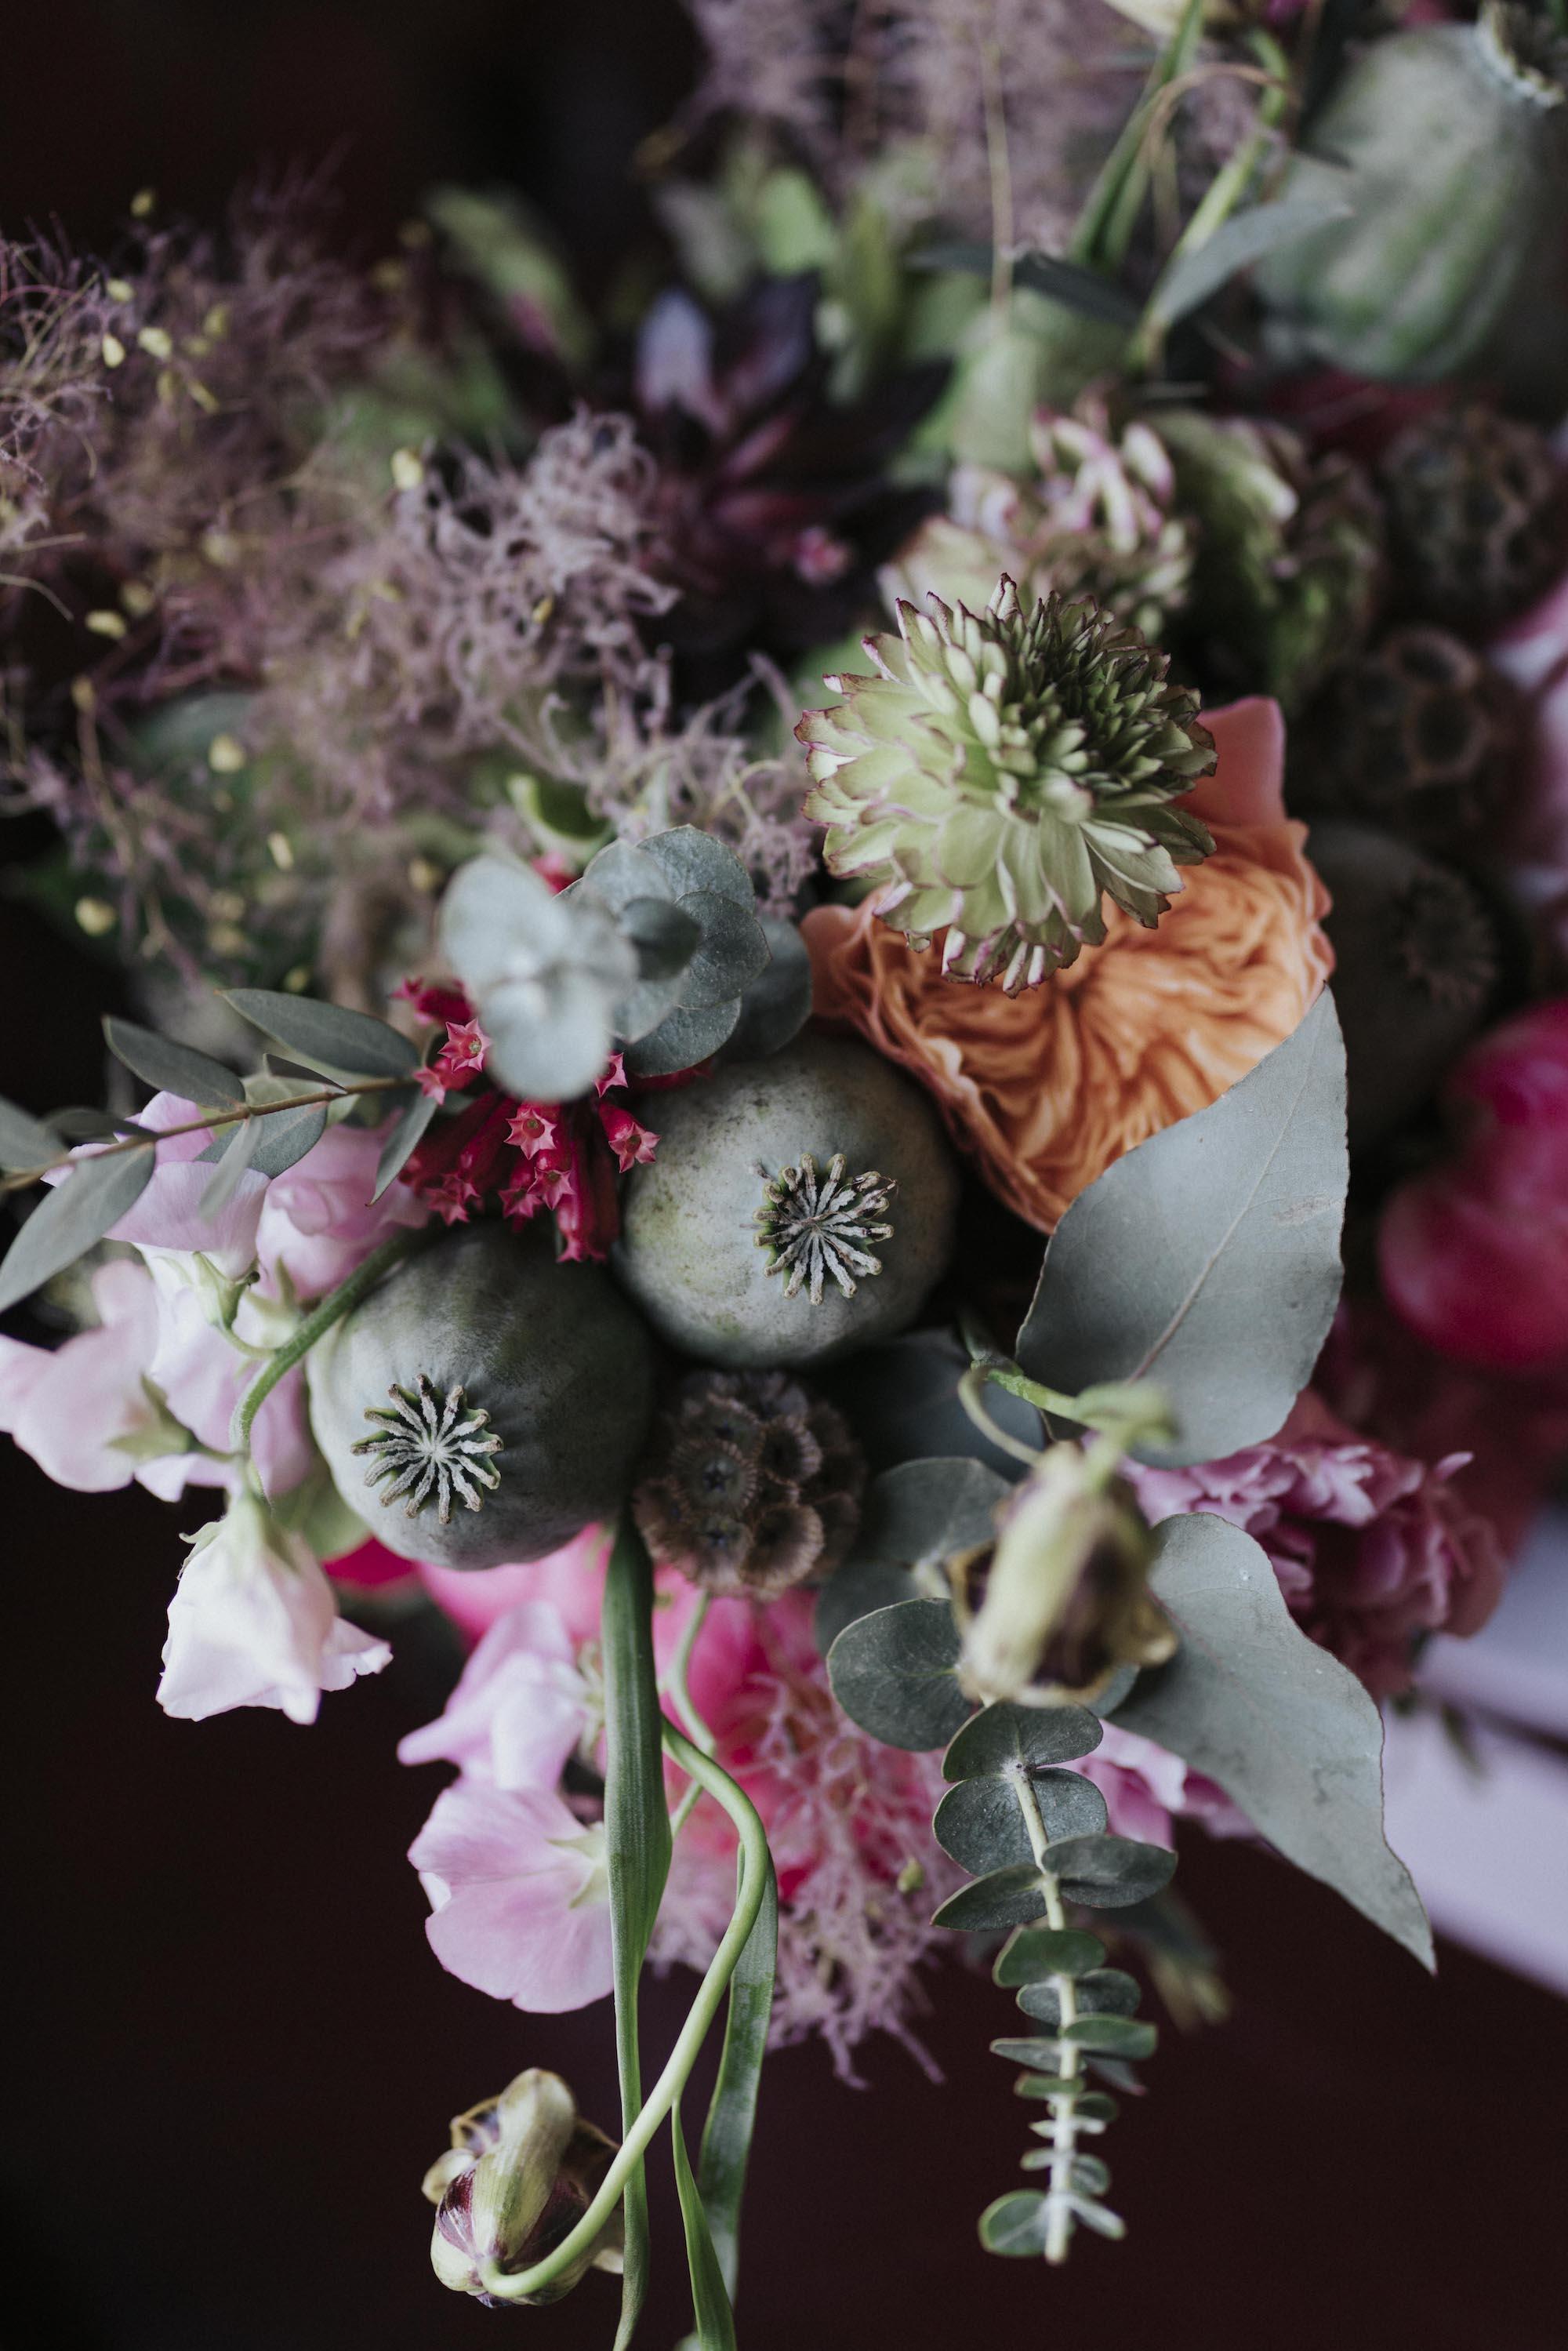 marProtea bouquet maristromsbogjorv@icloud.comistromsbogjorv@icloud.com